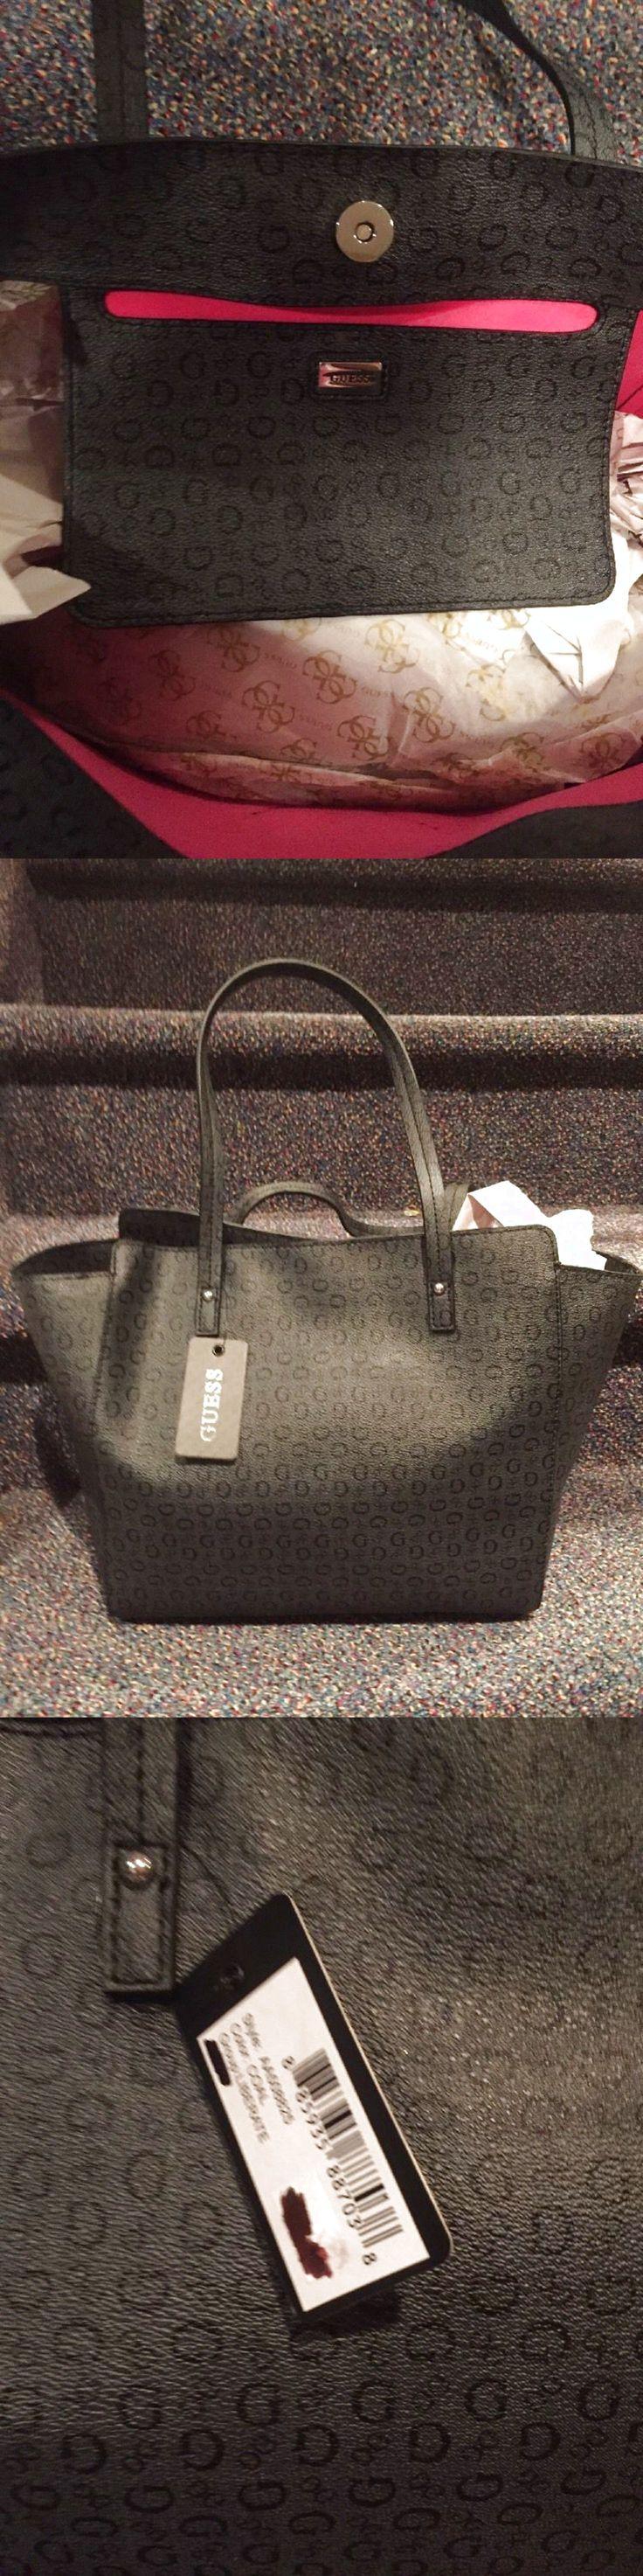 NEW Guess *Liberate*  Black Tote Handbag Bag Purse $45.0